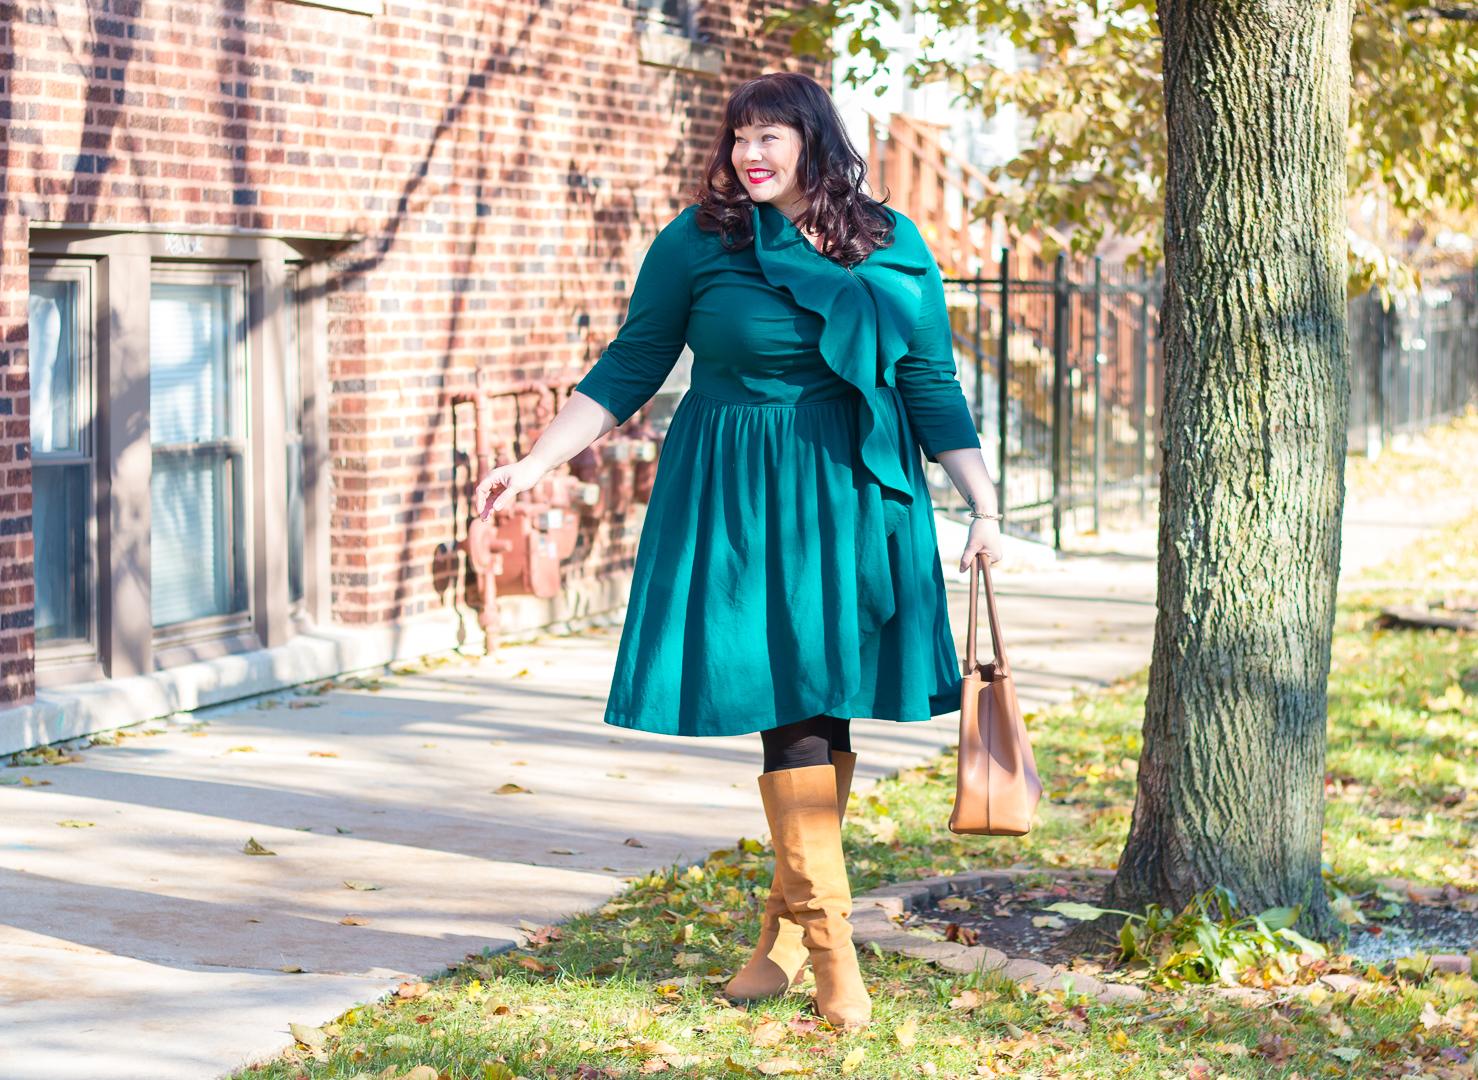 eShakti, custom plus size, Plus Size Holiday, Plus Size Style, Plus Size Fashion, Style Plus Curves, Chicago Blogger, Chicago Plus Size Blogger, Plus Size Blogger, Amber McCulloch